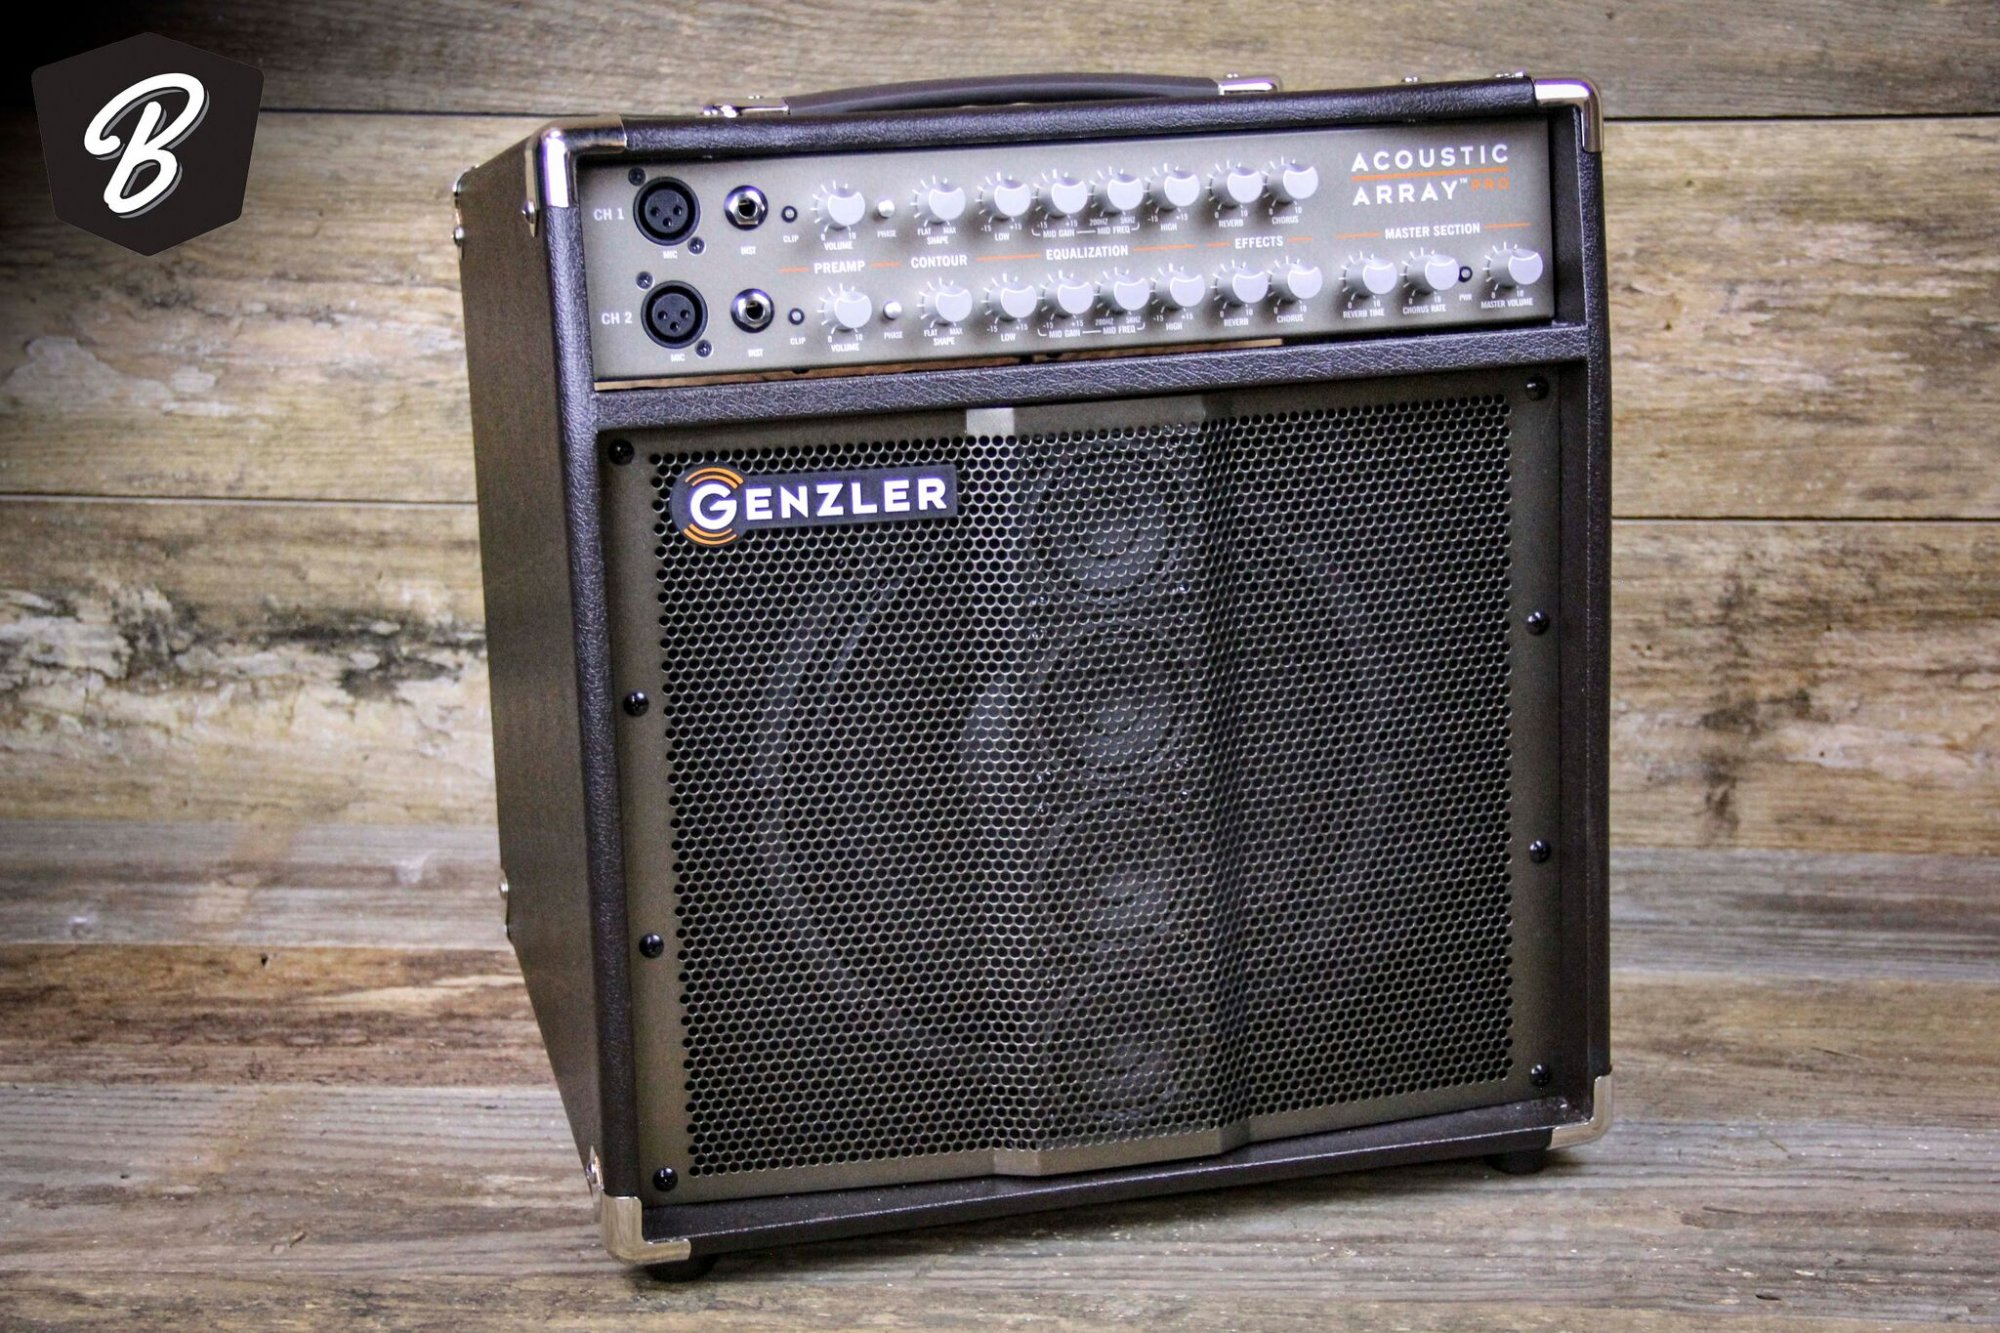 Genzler Acoustic Array Pro 2-Channel Amp